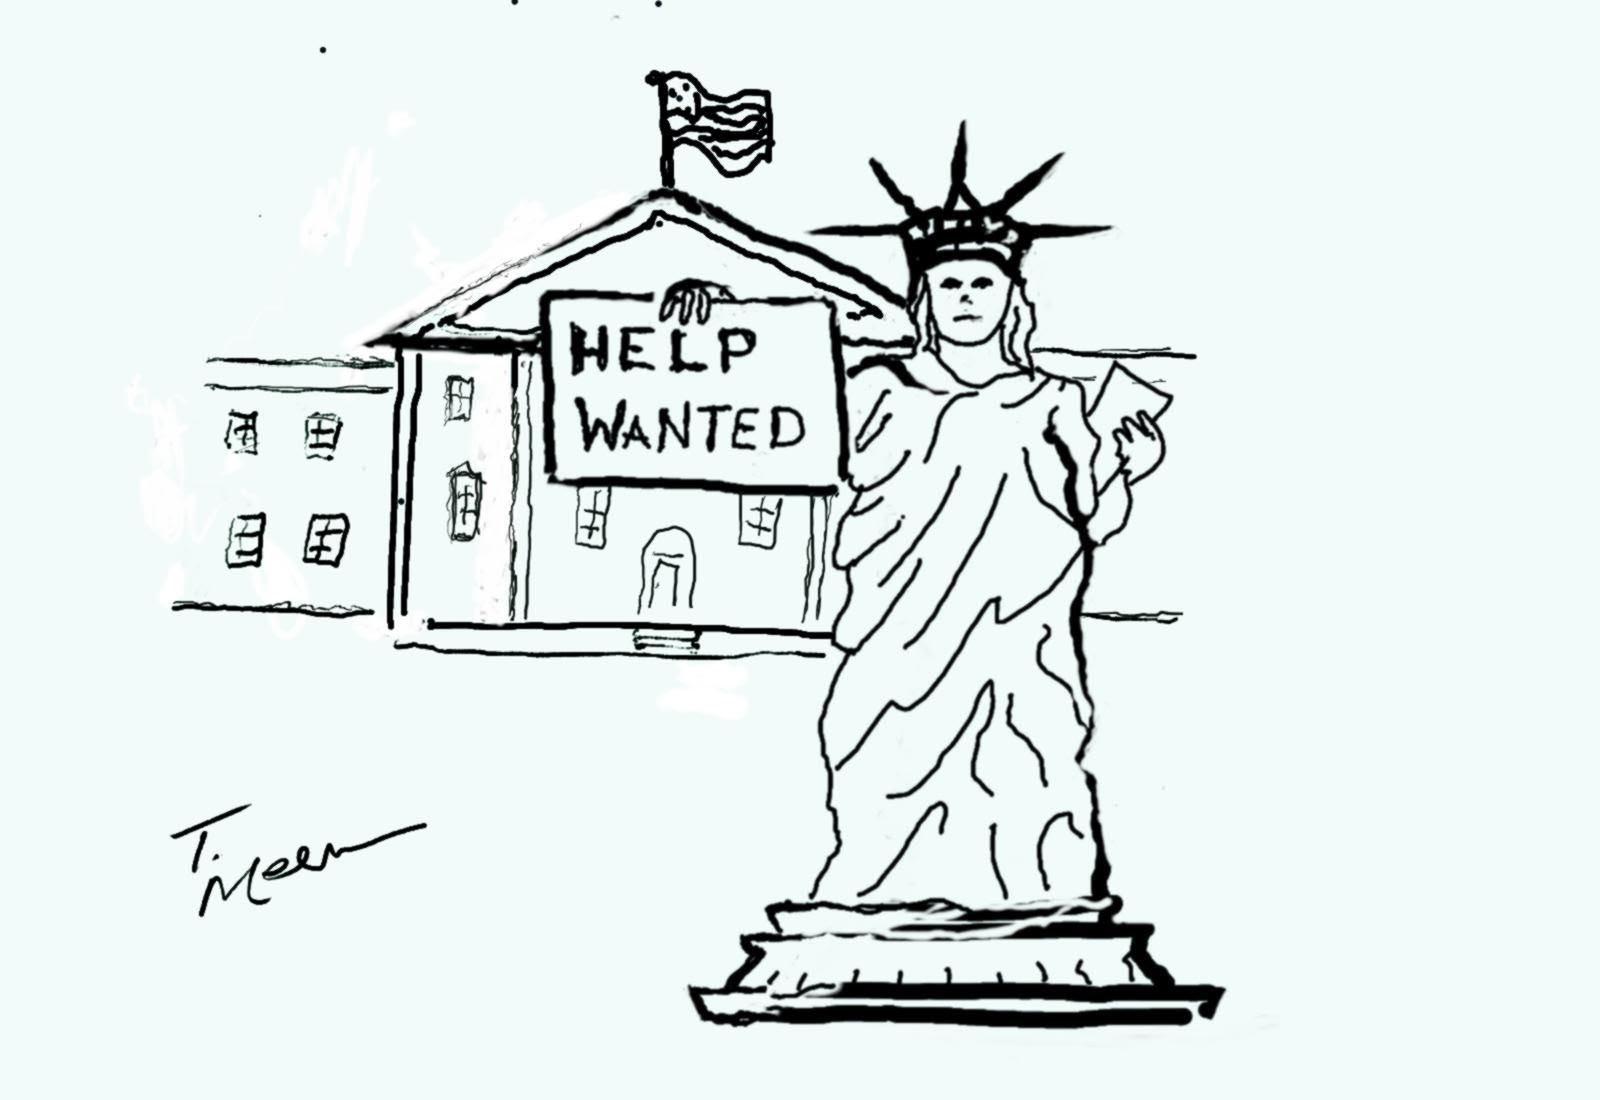 Cartoon by Tom Mercer.